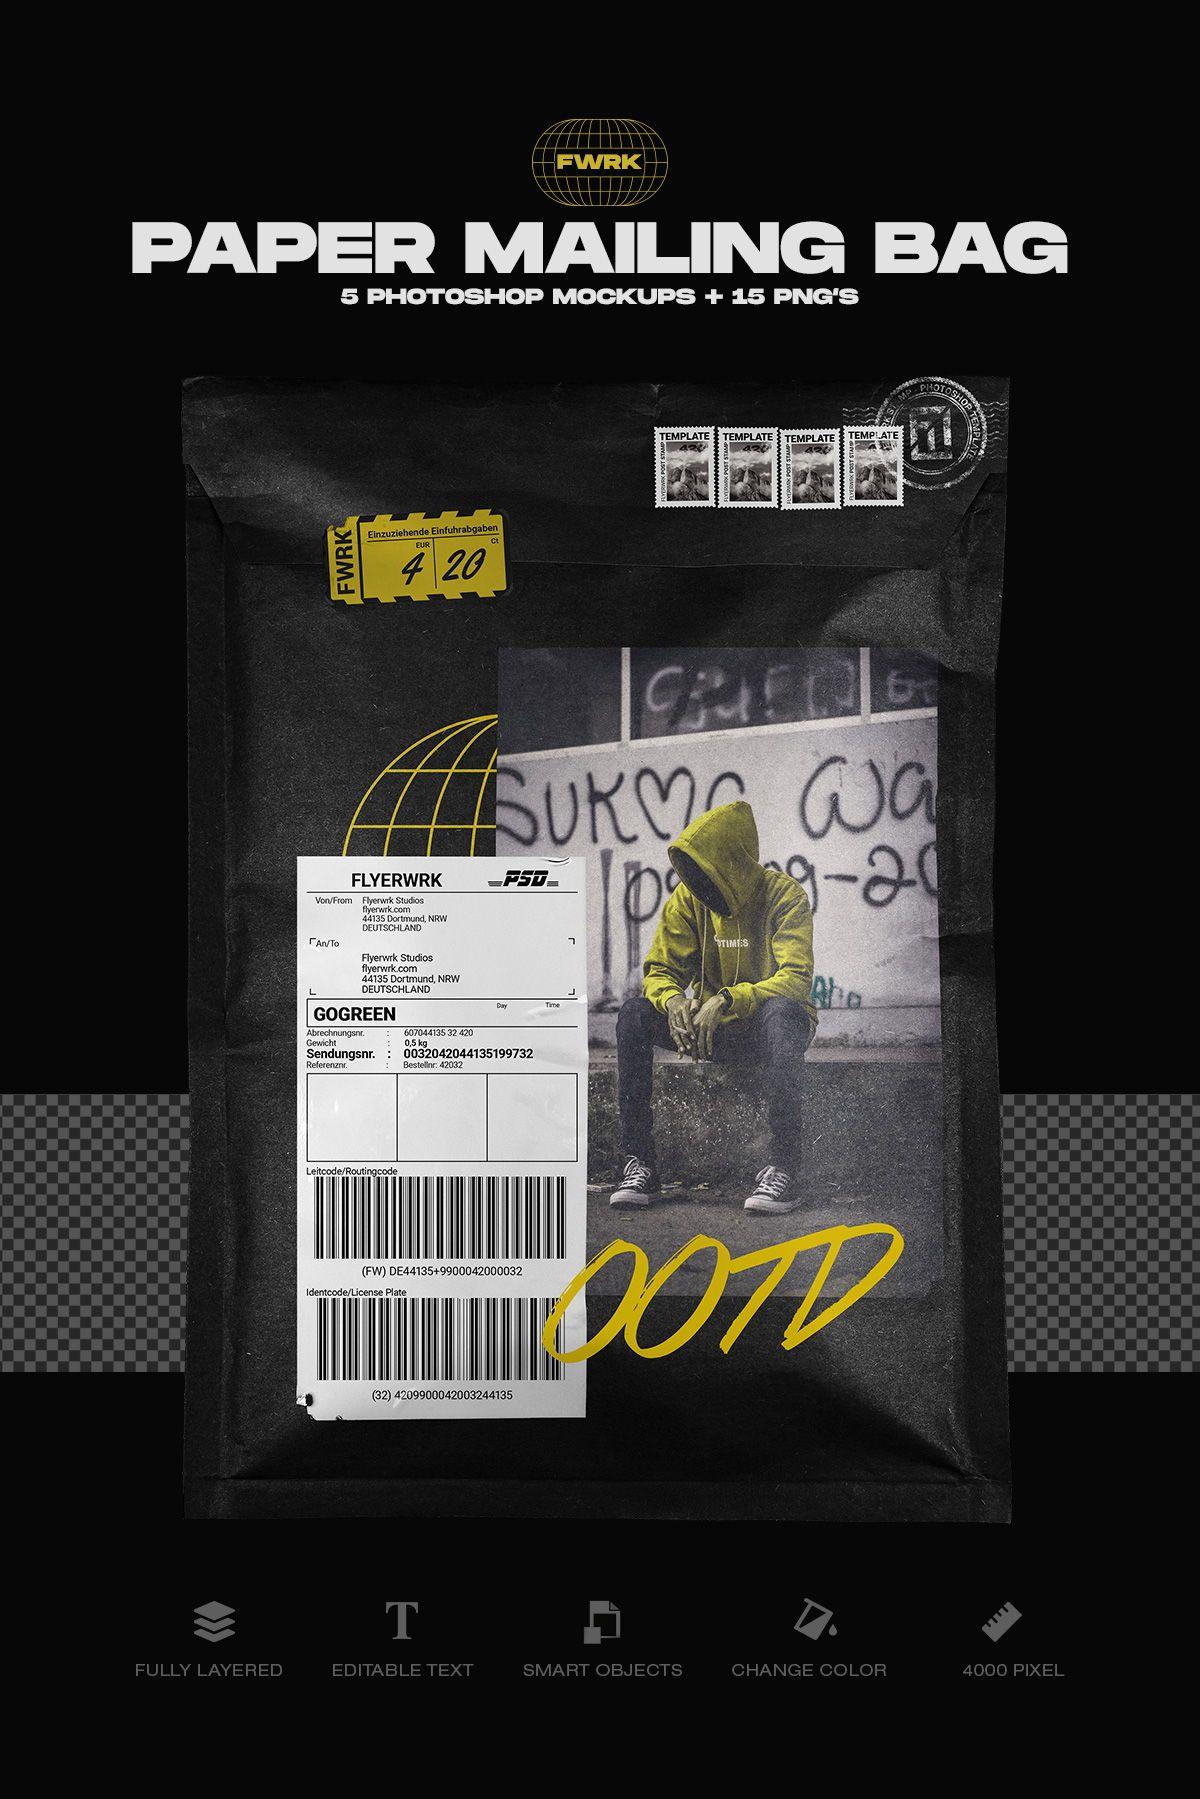 Paper Mailing Bag Photoshop Mockup Photoshop Mockup Graphic Design Posters Photoshop